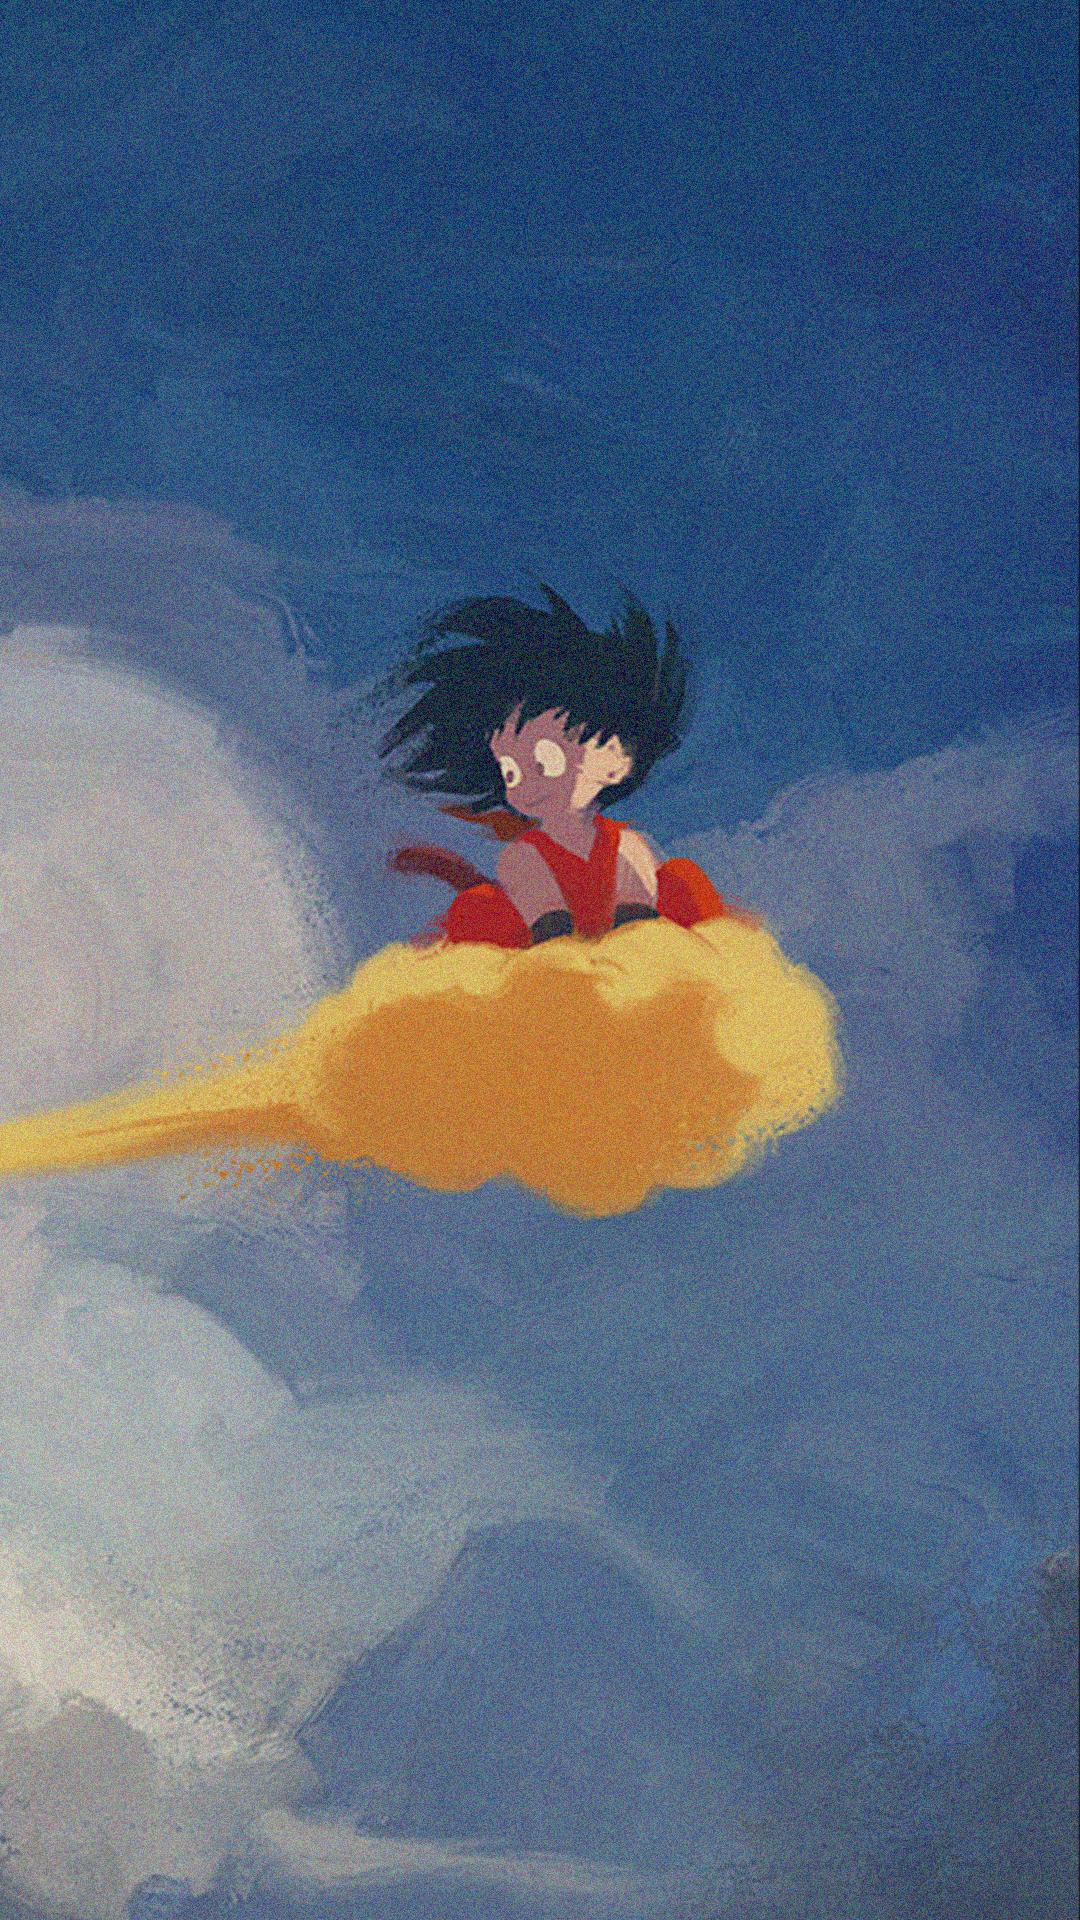 Goku Anime Wallpaper Anime Wallpaper Phone 1080x1920 Download Hd Wallpaper Wallpapertip